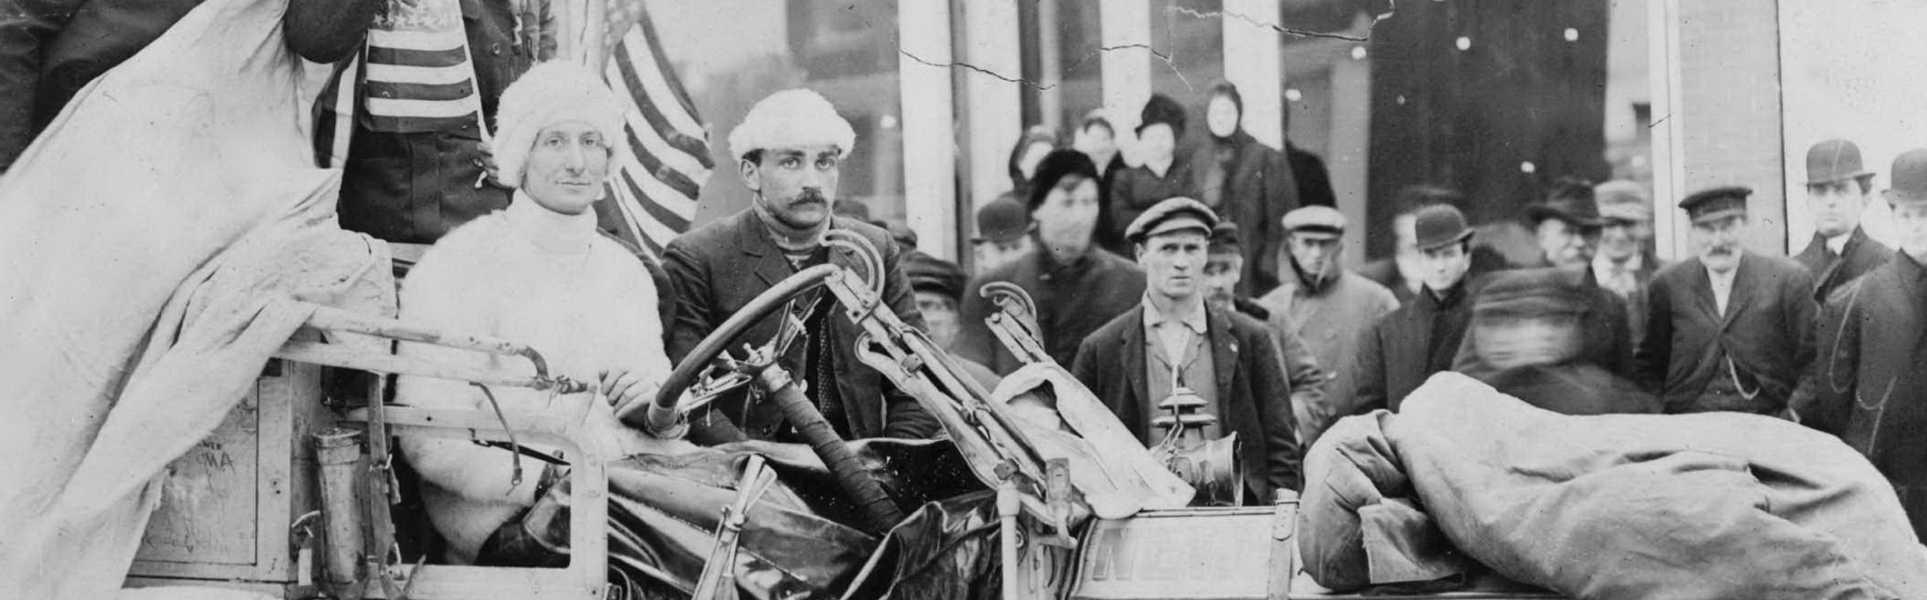 prescale The 1908 Race Around the World